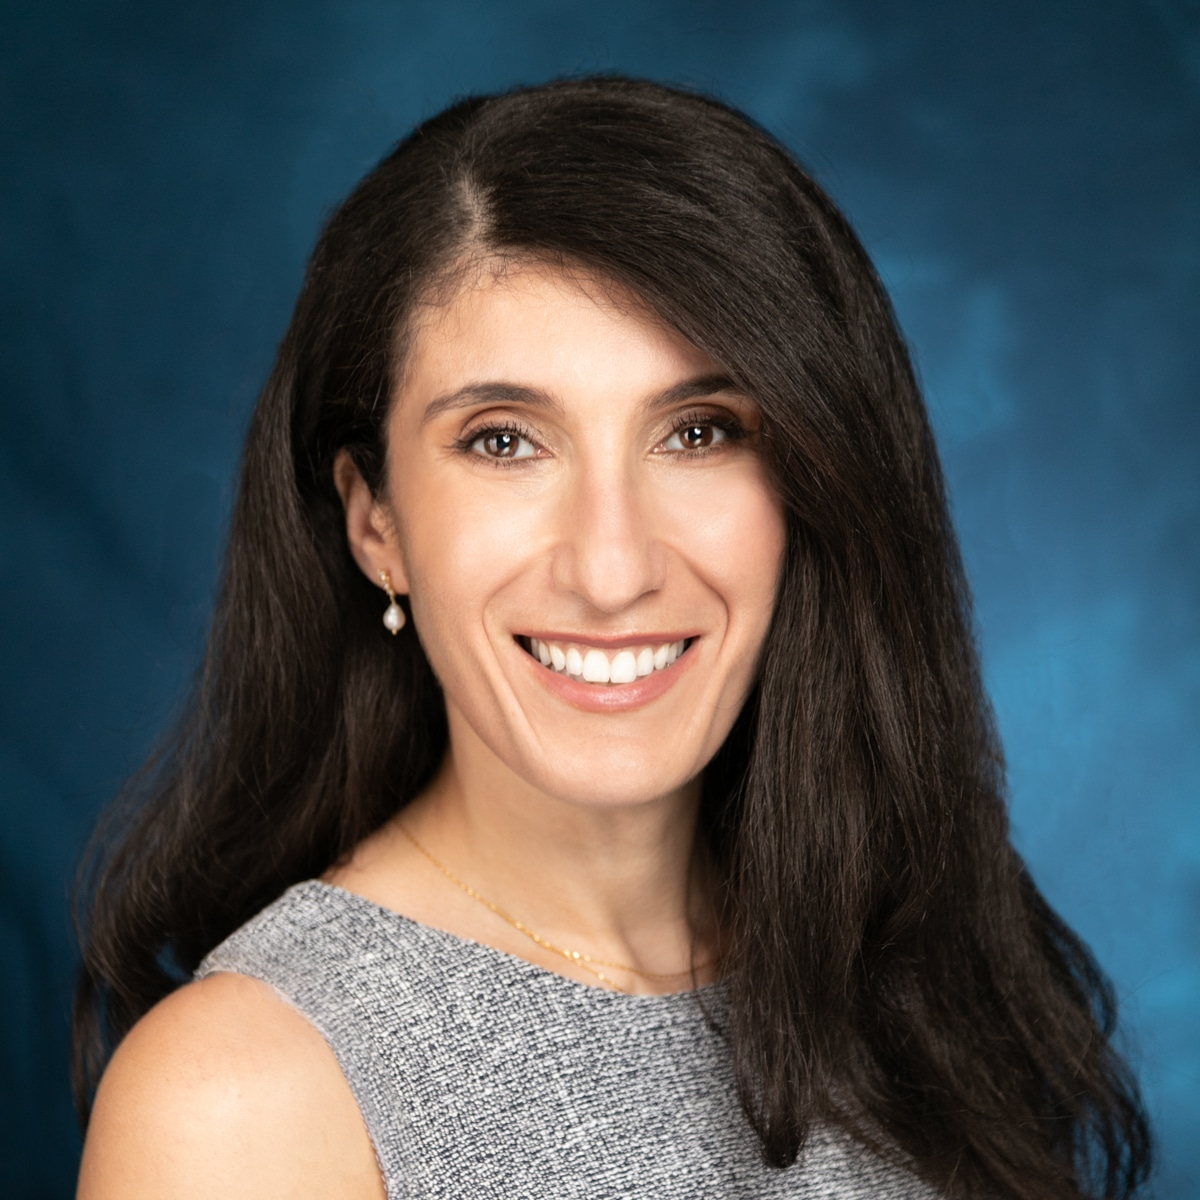 Marina Arutyunyan Board Certified Gynecologist, NY